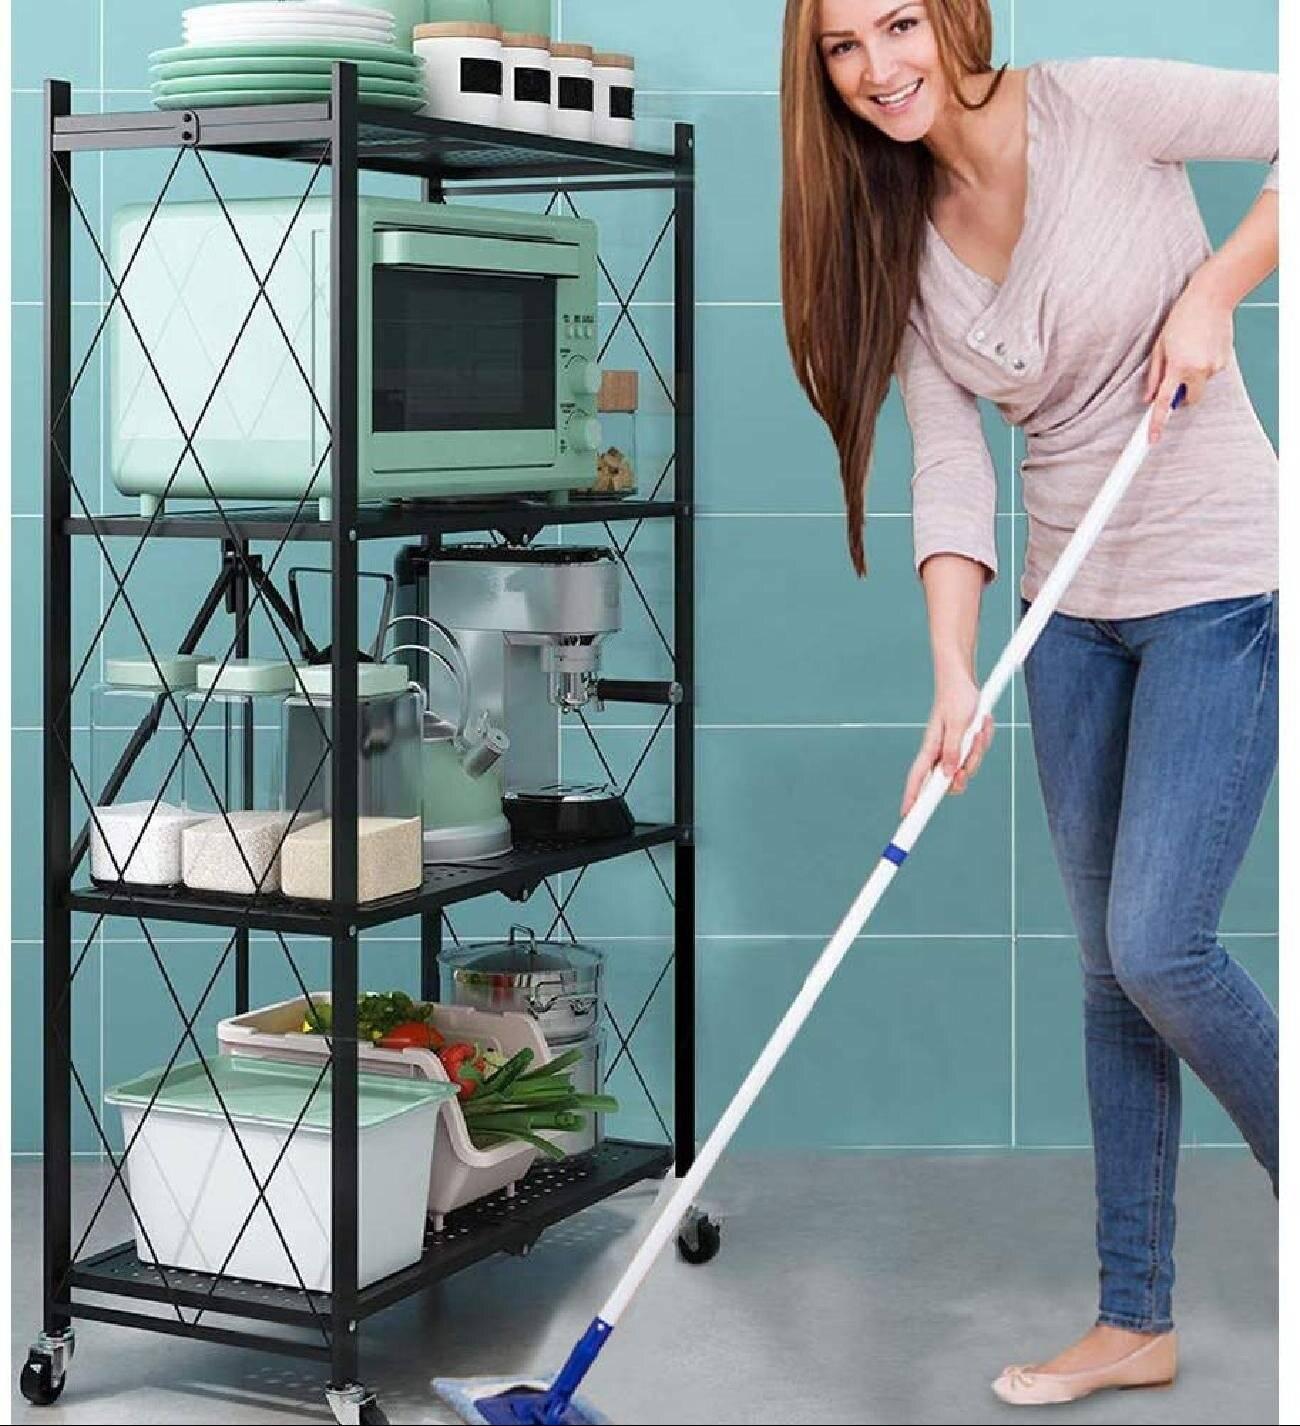 kitchen rack, 4 tier shelf, laundry room shelving, kitchen shelf